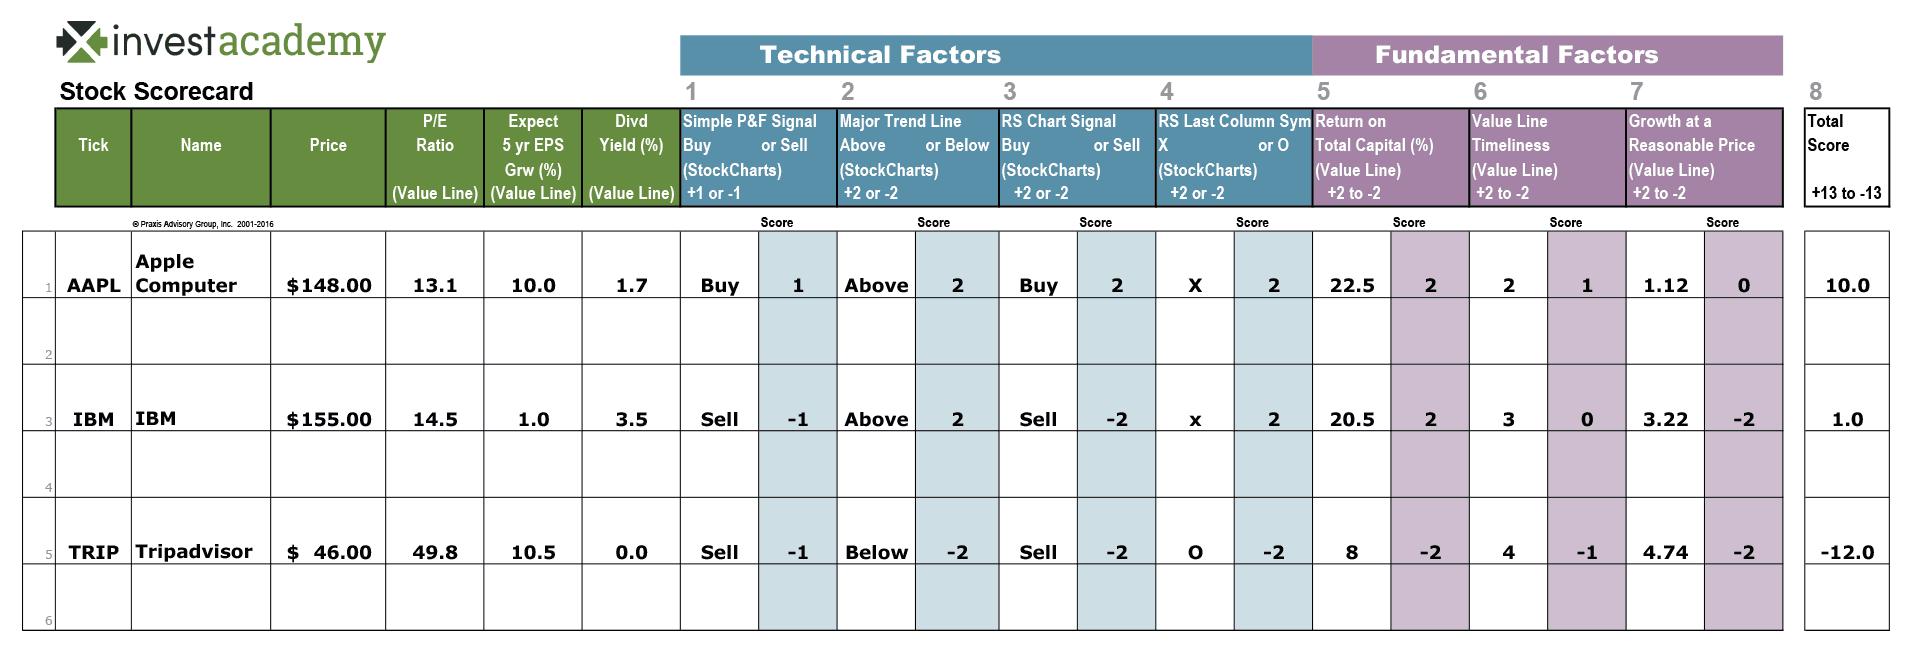 InvestAcademy Stock Scorecard Sample